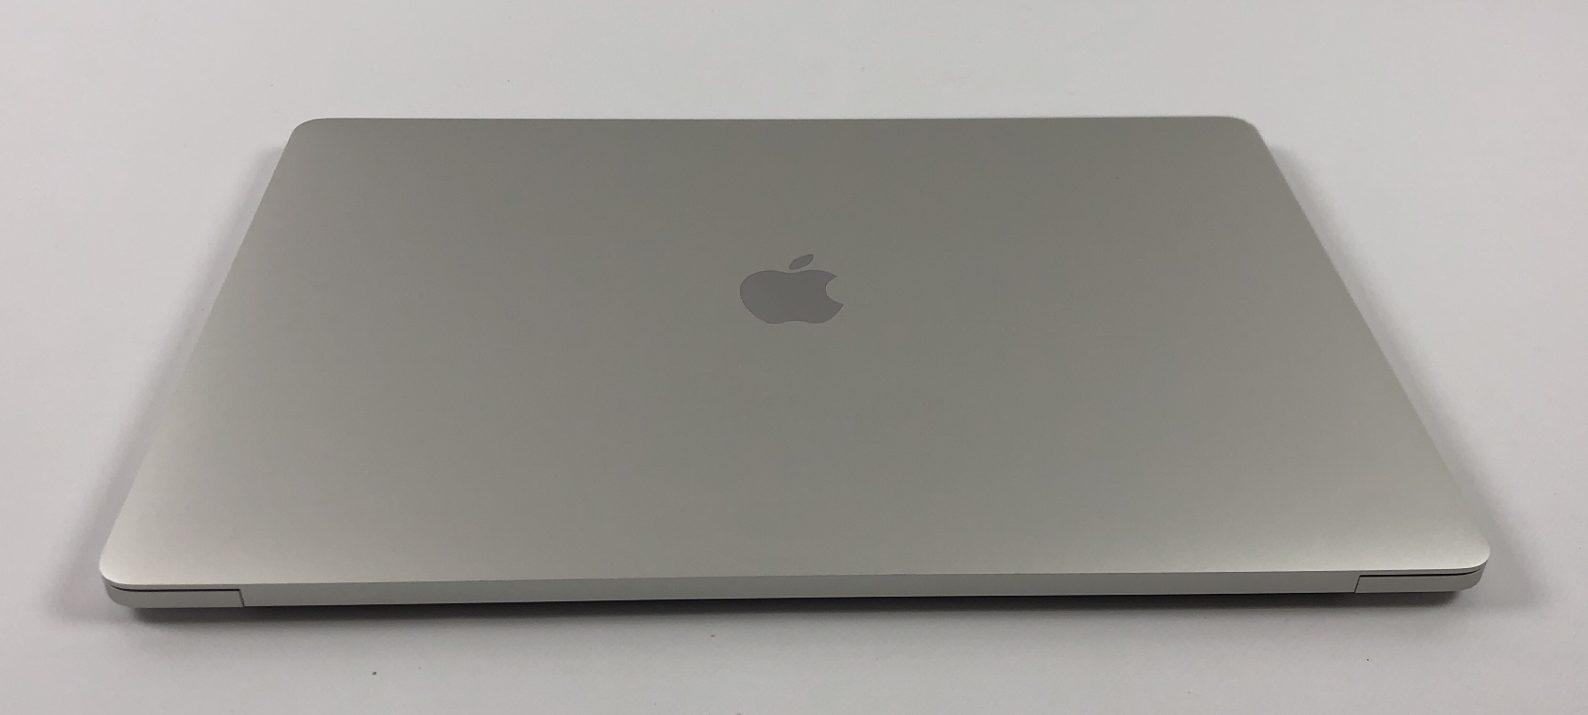 "MacBook Pro 15"" Touch Bar Mid 2018 (Intel 6-Core i7 2.2 GHz 16 GB RAM 512 GB SSD), Space Gray, Intel 6-Core i7 2.2 GHz, 16 GB RAM, 512 GB SSD, imagen 2"